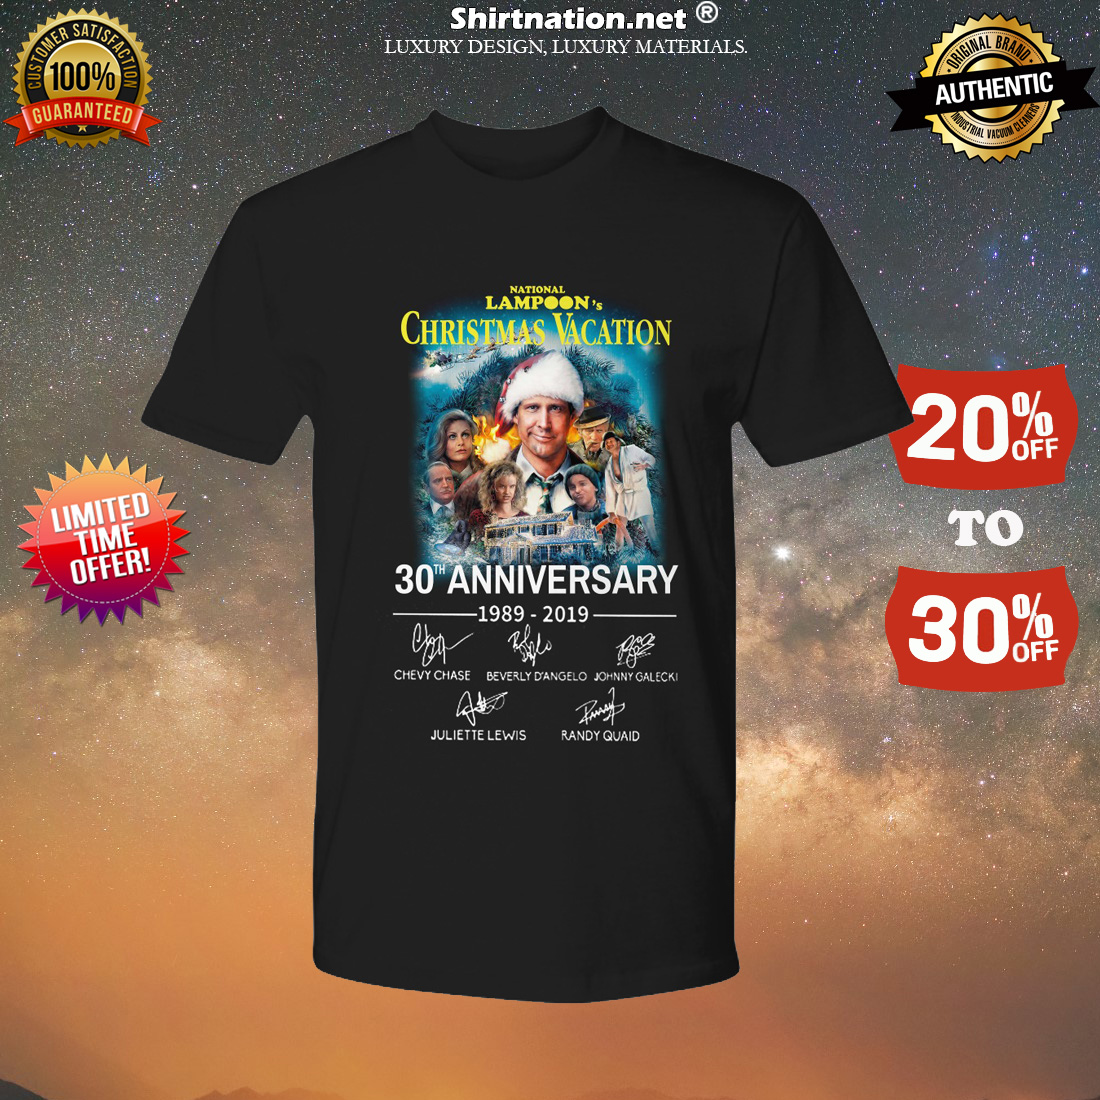 National lampoon christmas vacation 30th anniversary shirt